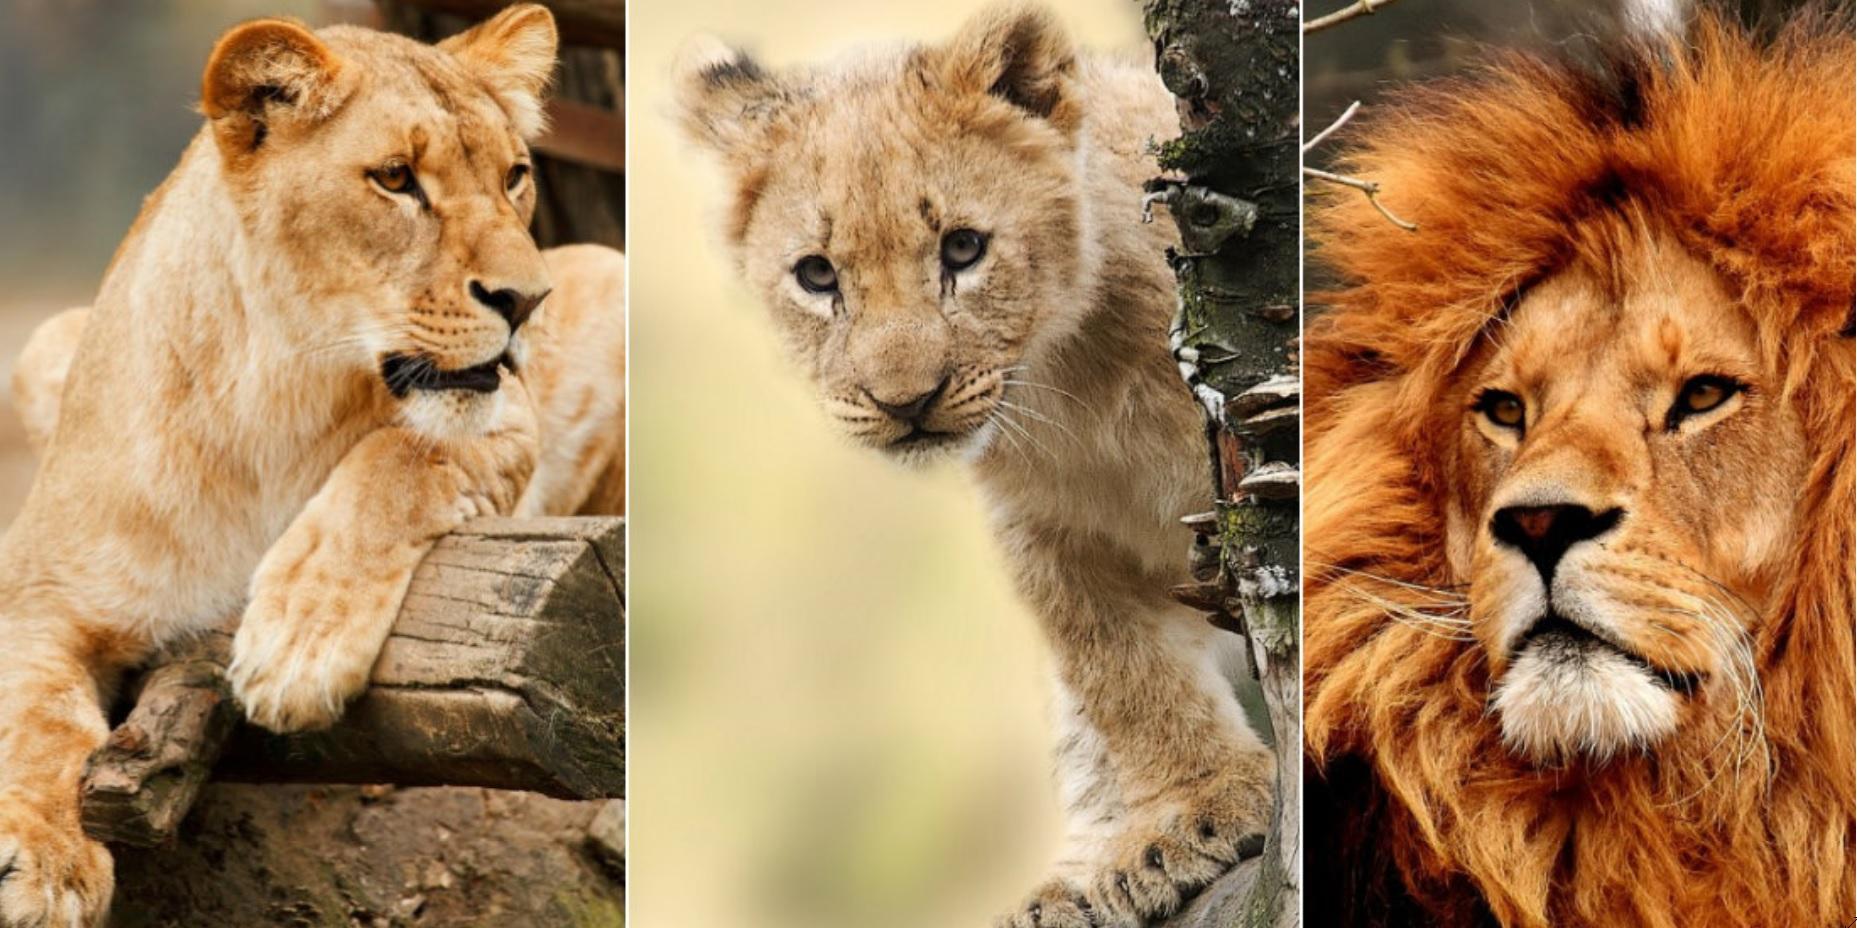 la melena del leon como se llama